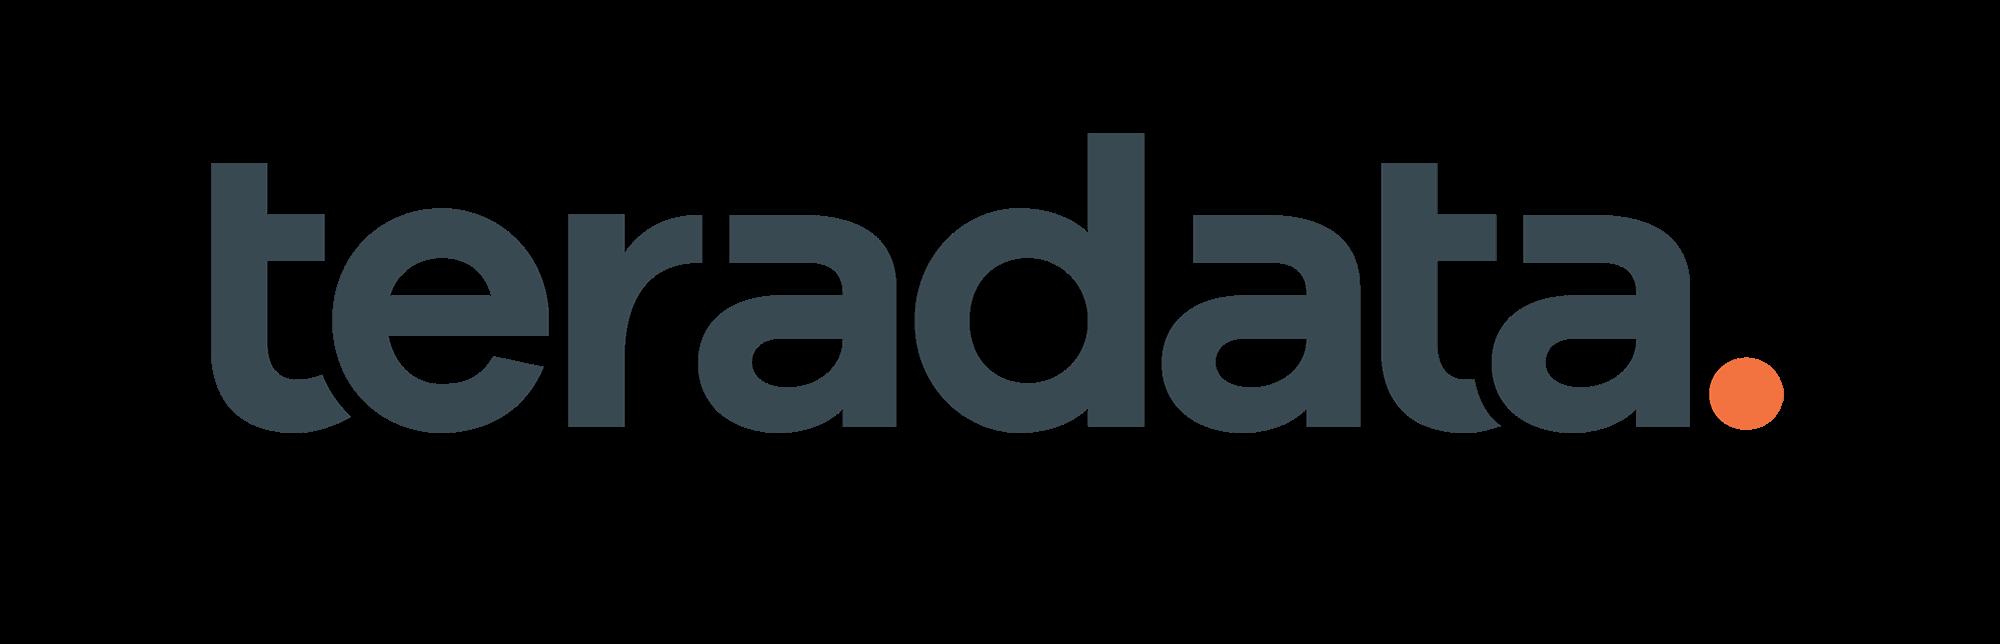 Teradata_logo-two_color